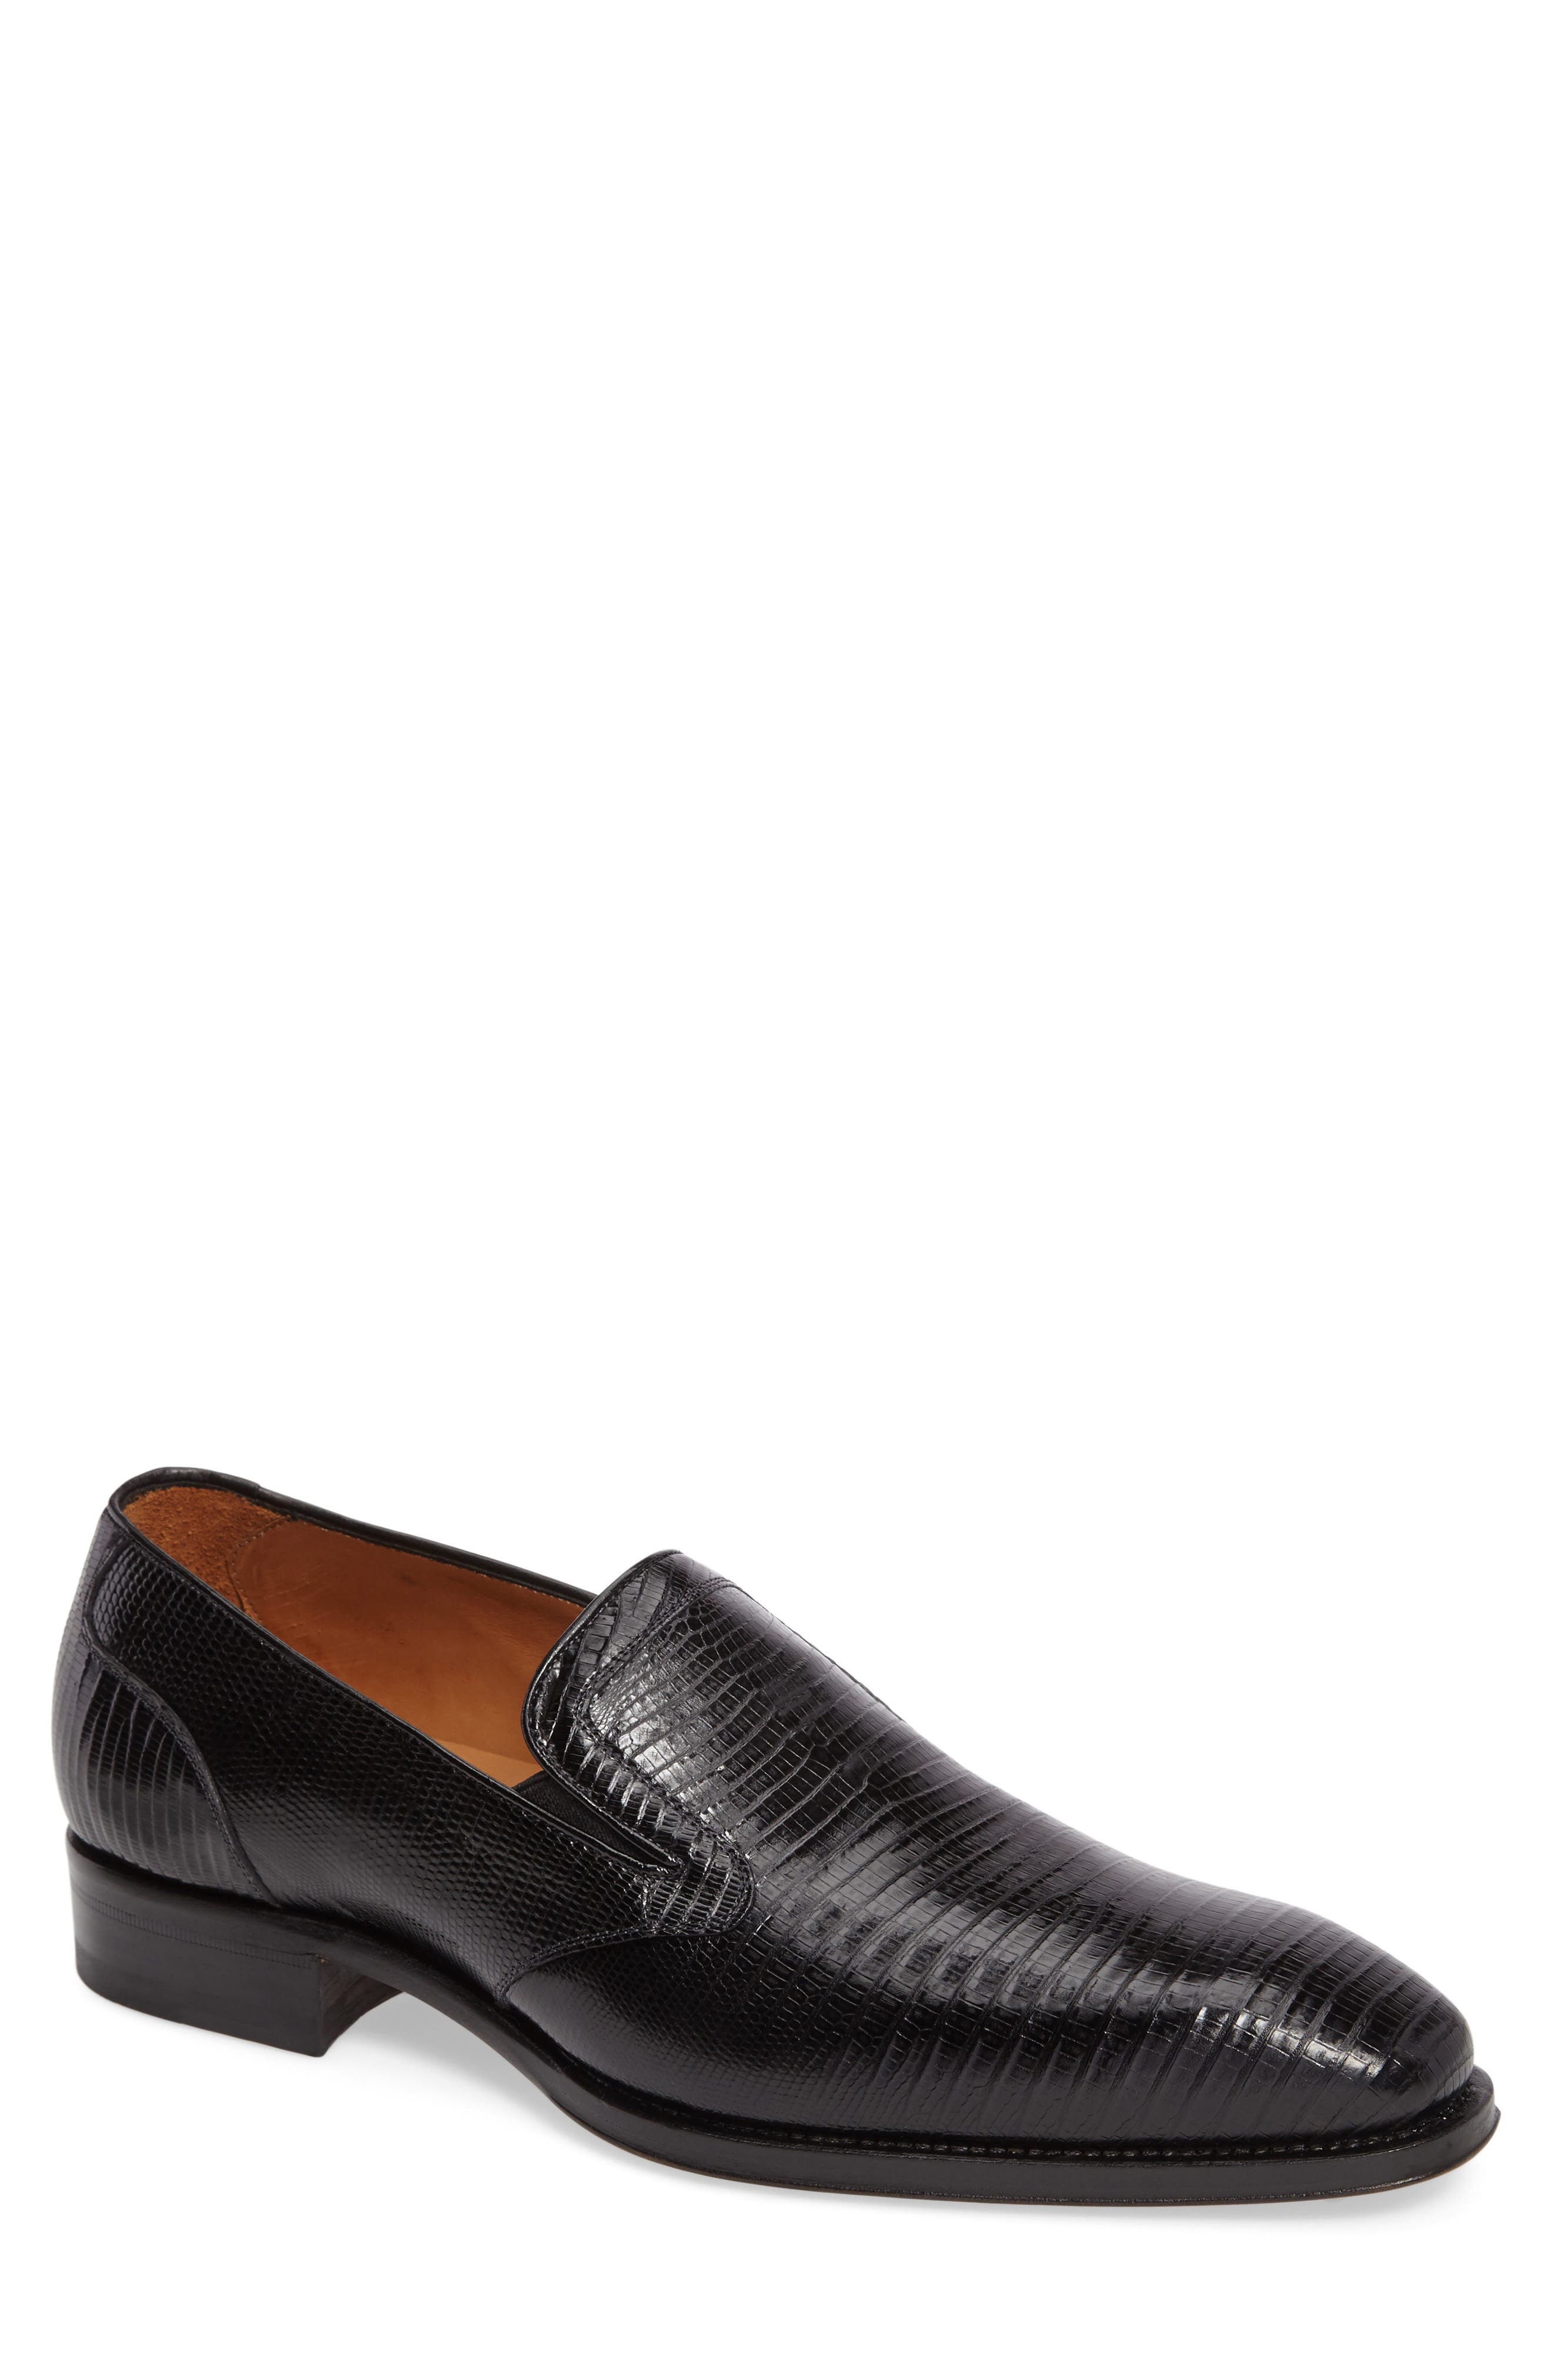 Hooke Venetian Loafer,                         Main,                         color, BLACK